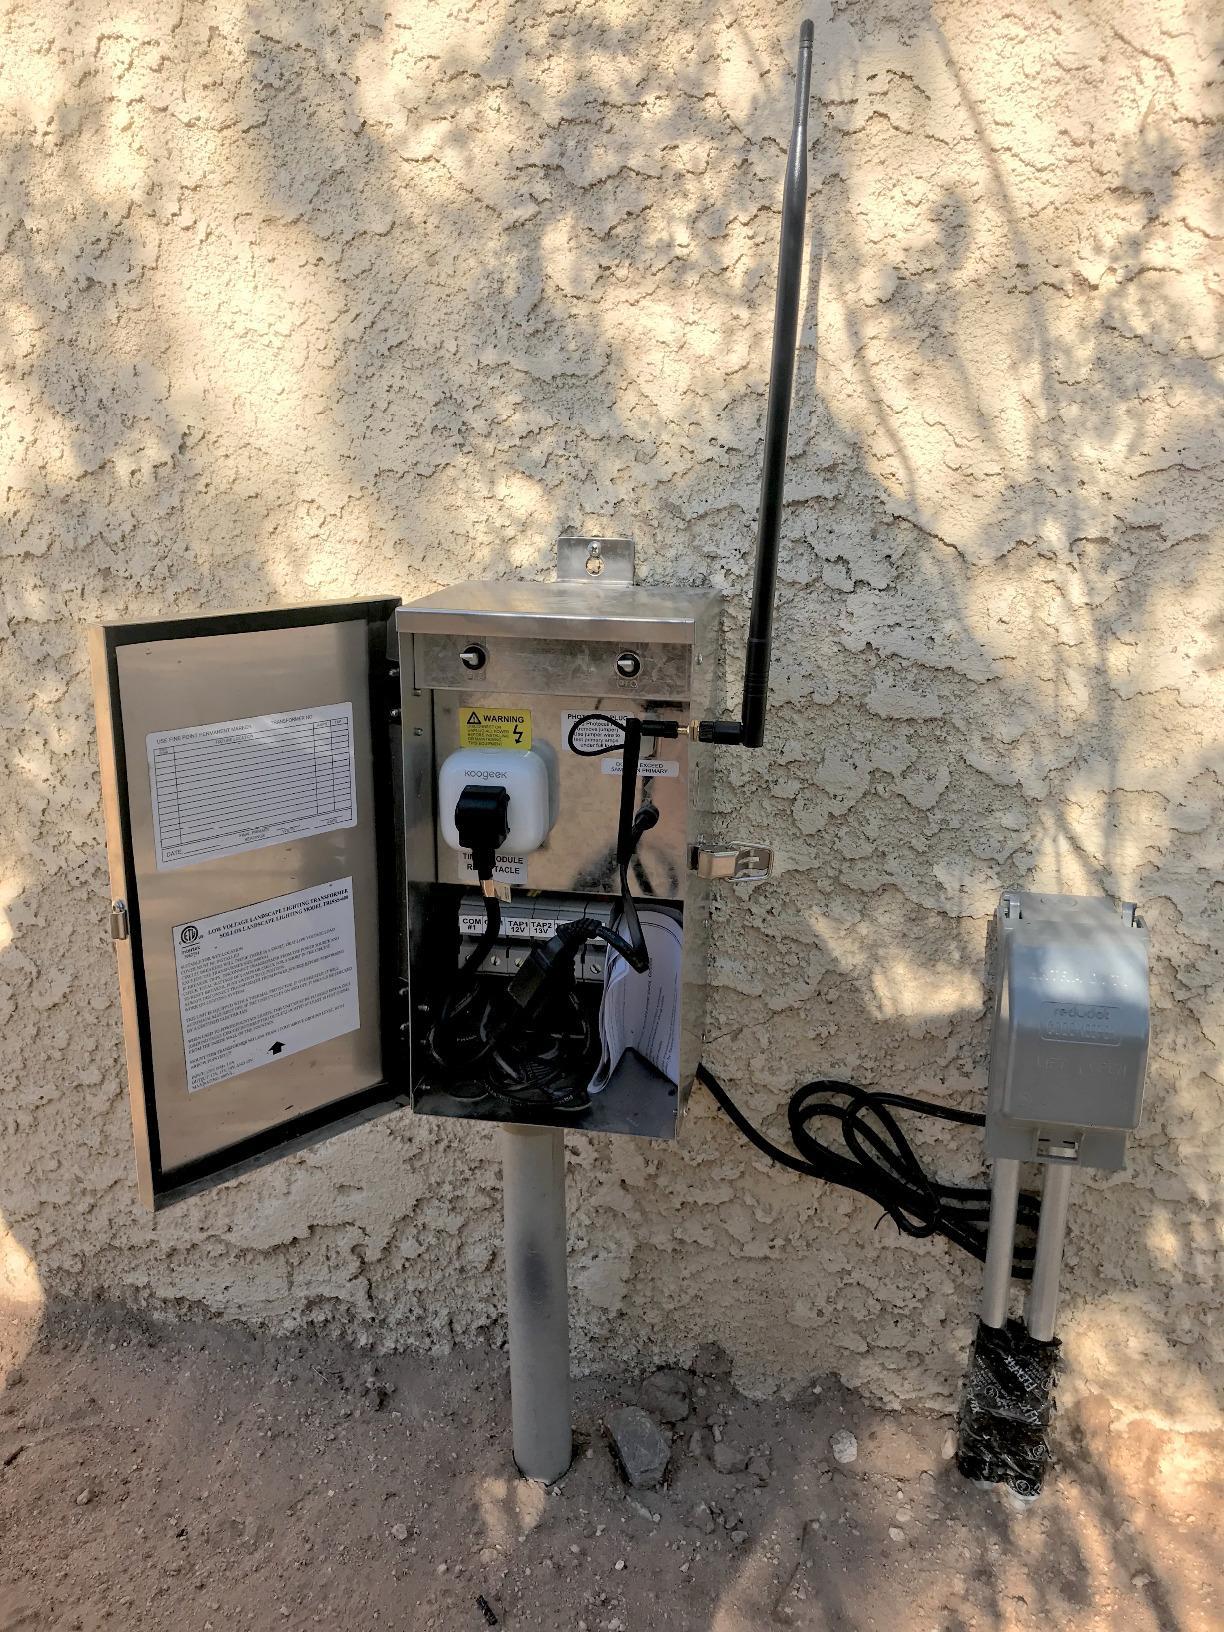 Black Koogeek Home Smart Plug Wi Fi Enabled Works With